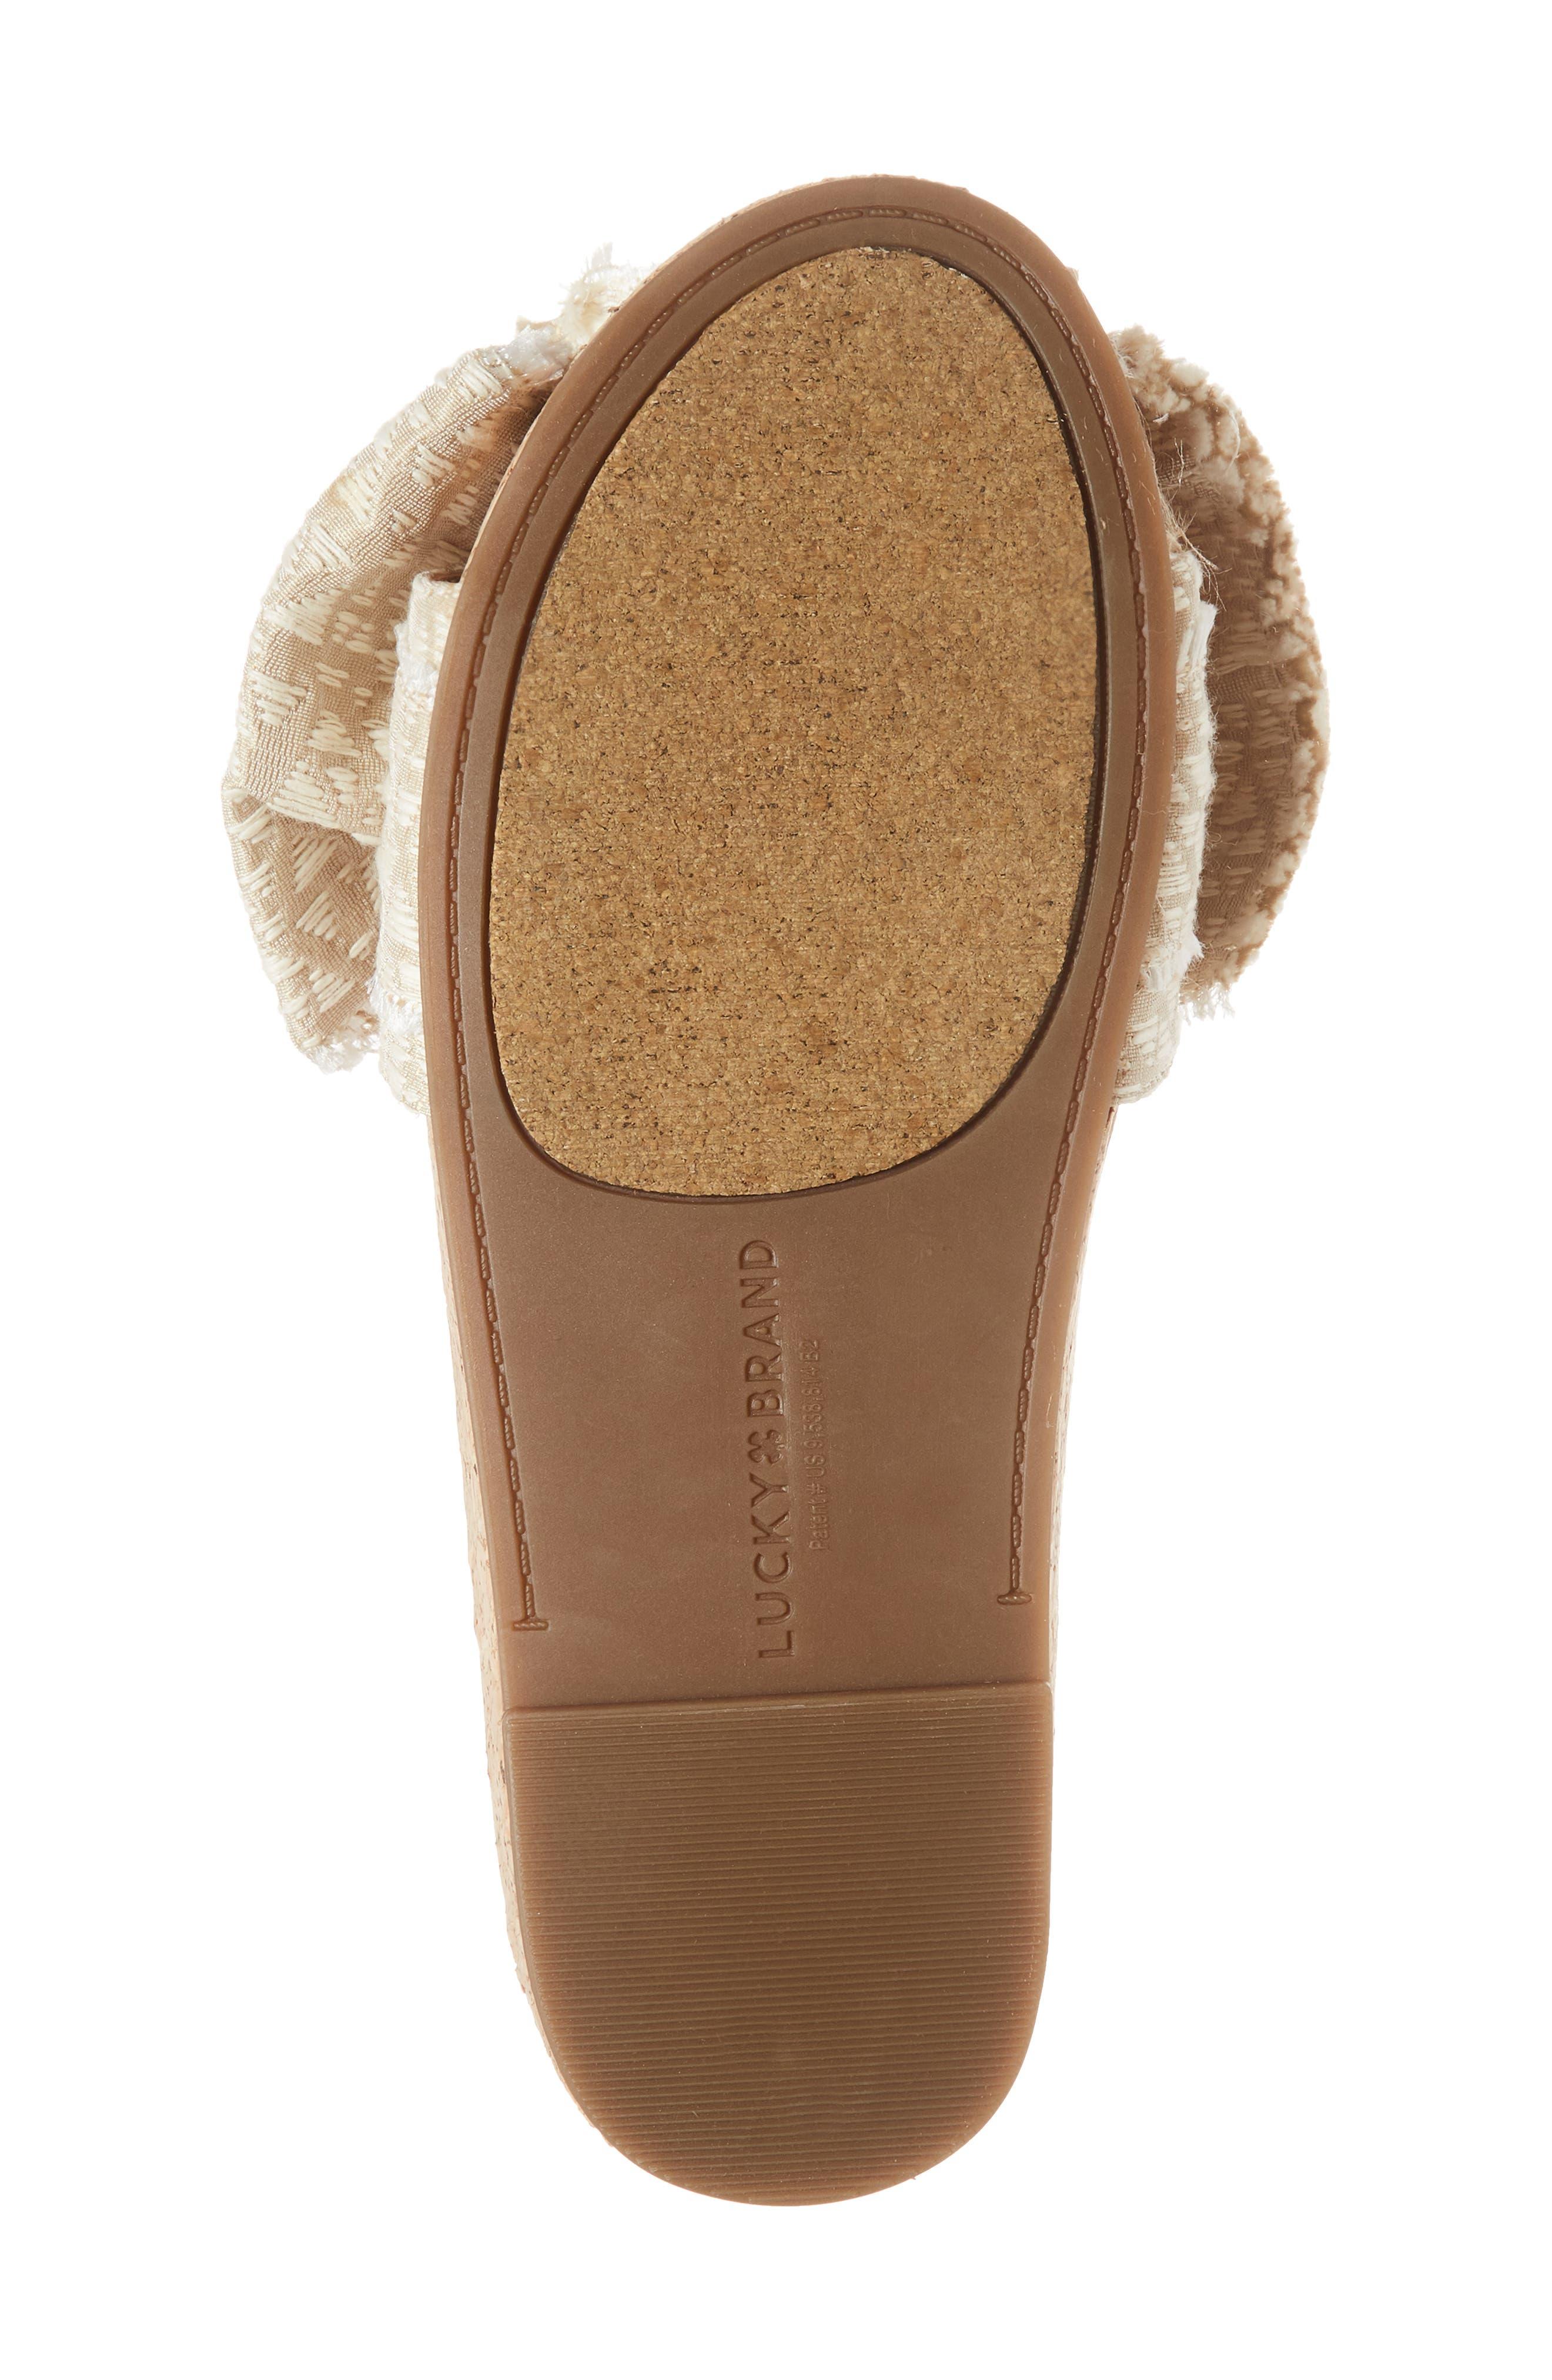 Floella Bow Slide Sandal,                             Alternate thumbnail 6, color,                             270